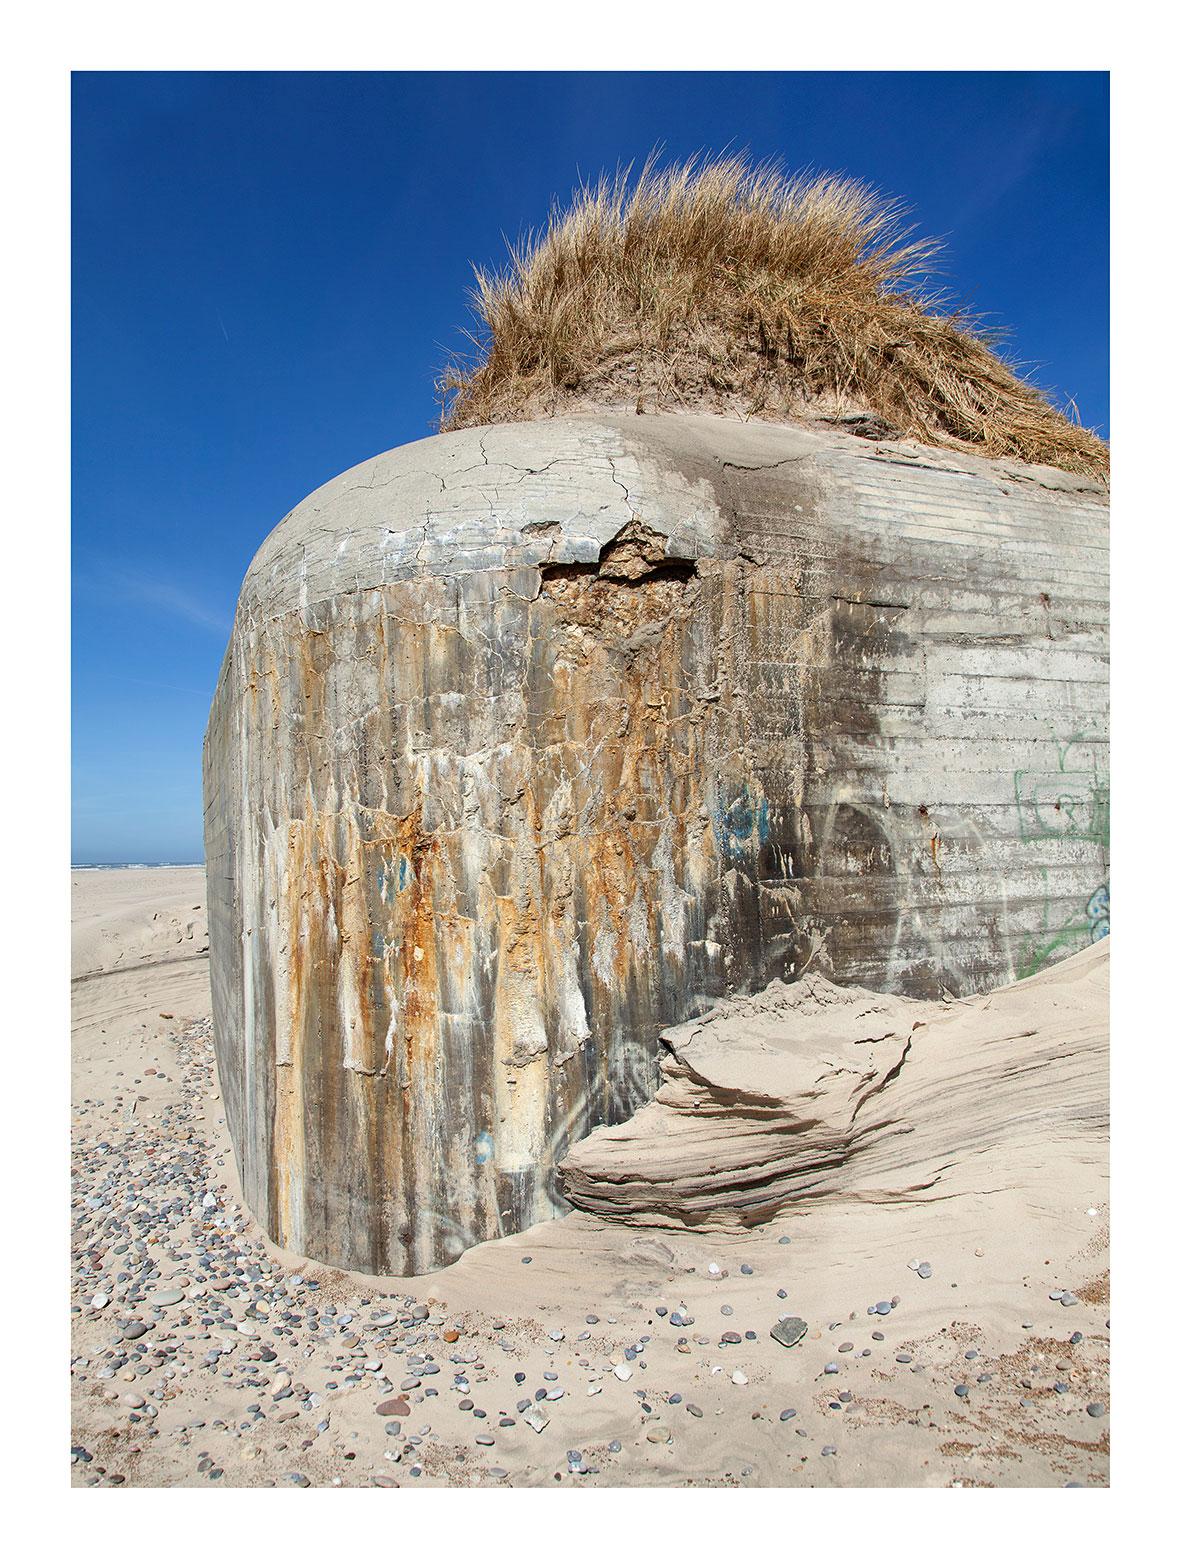 Blockhouse No 19 59 x 44cms edition 100 by Artist Nicholas Gentilli